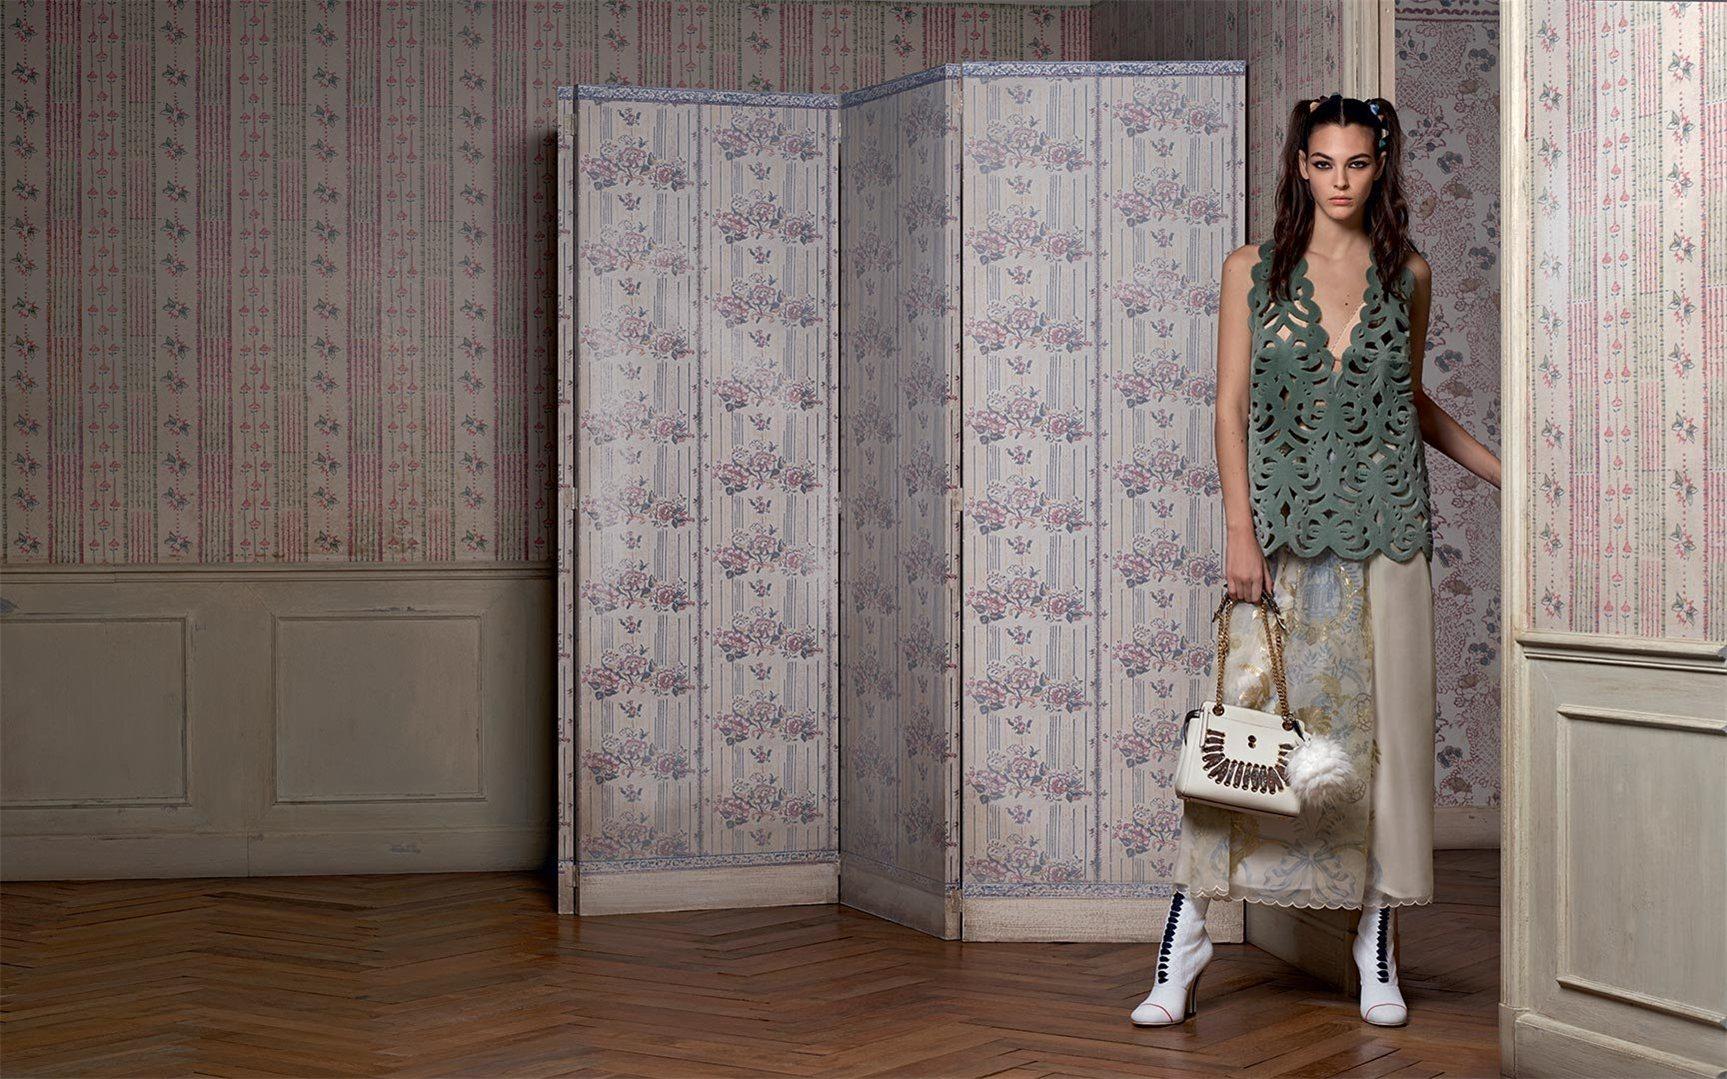 Fendi spring/summer 2017 - Vittoria Ceretti by Karl Lagerfeld